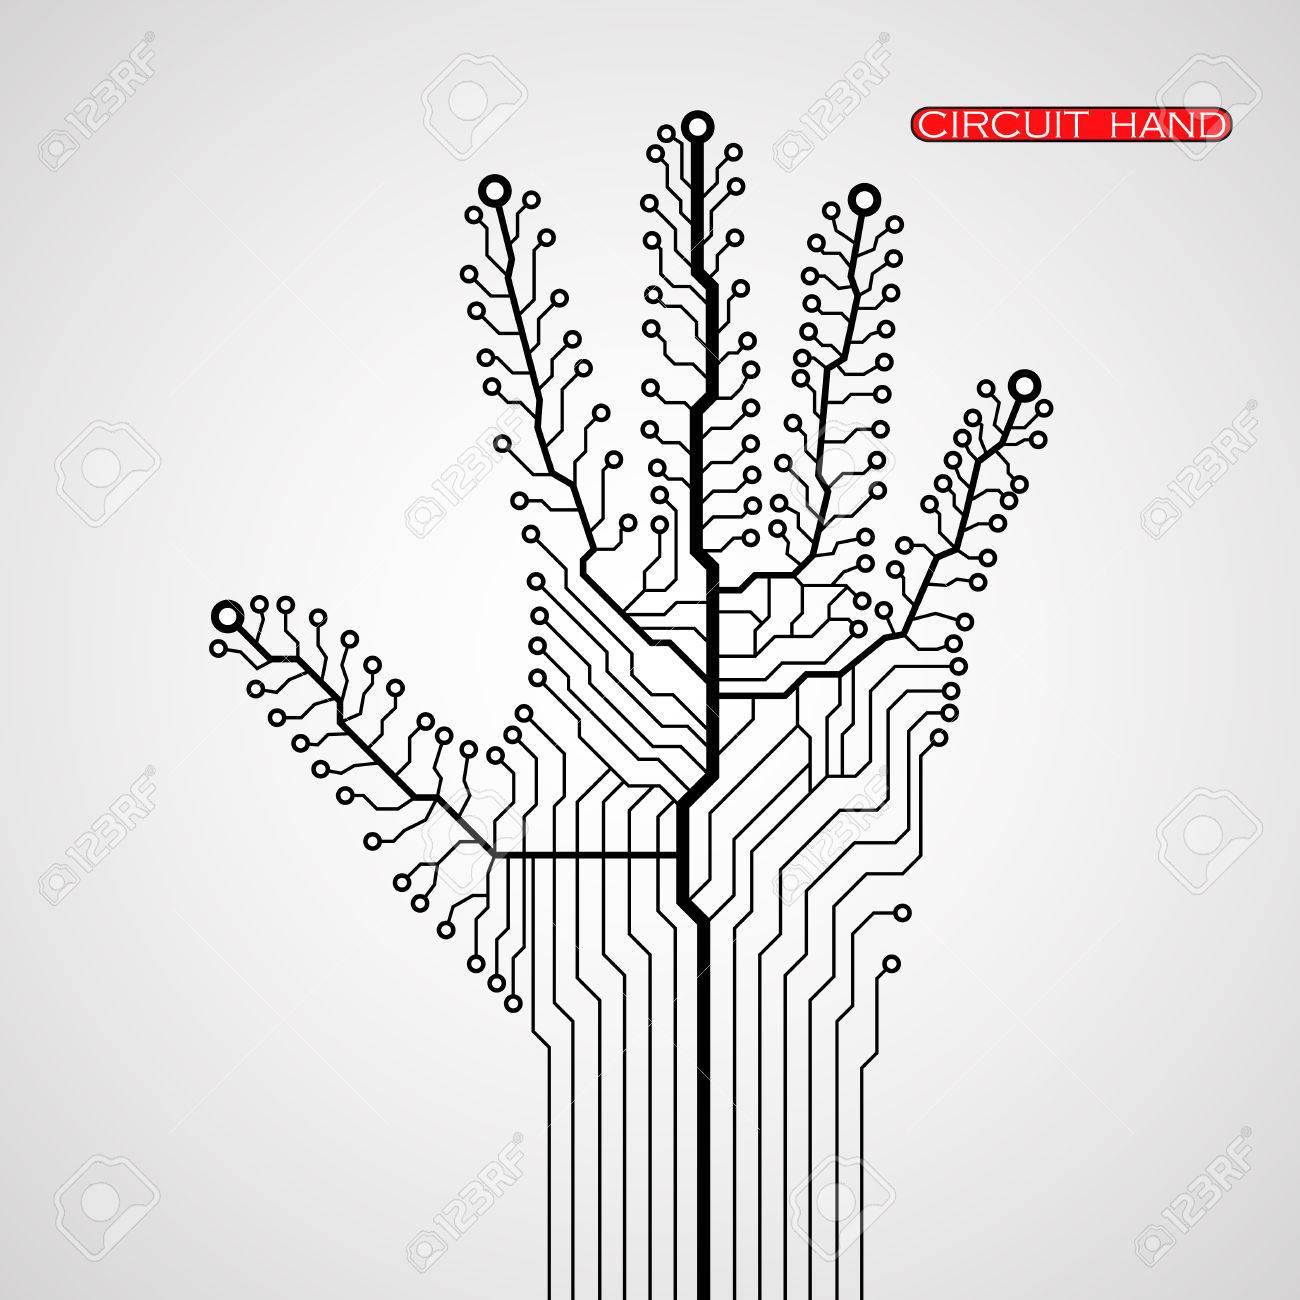 Circuito Vascular : Circuit abstract hand. vector illustration. eps 10 royalty free